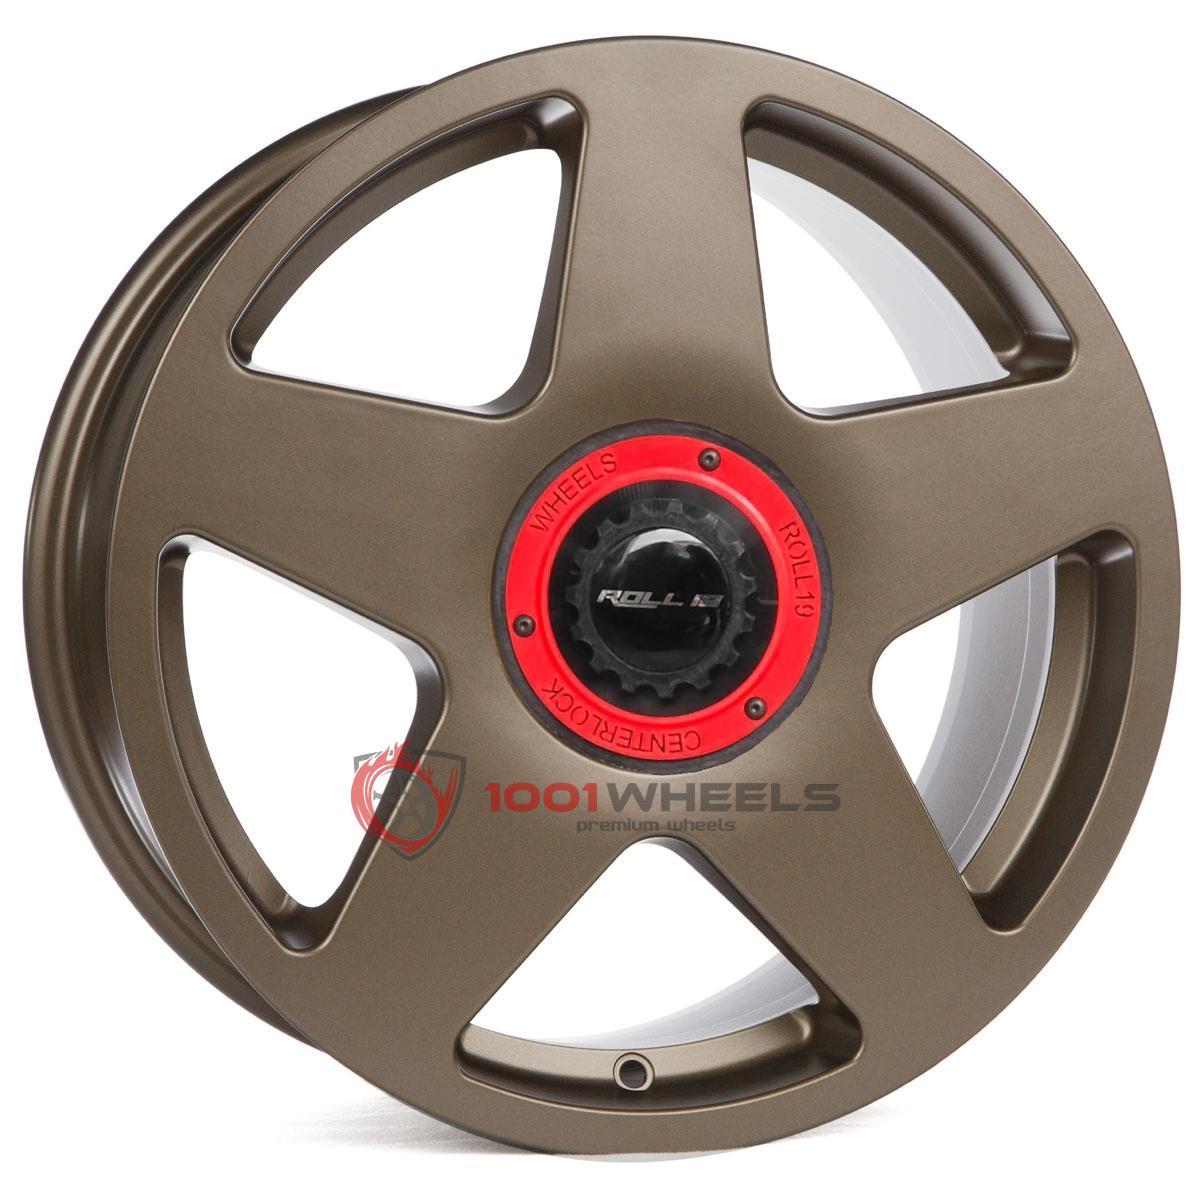 Roll19 R14 bronze-center-lock-red